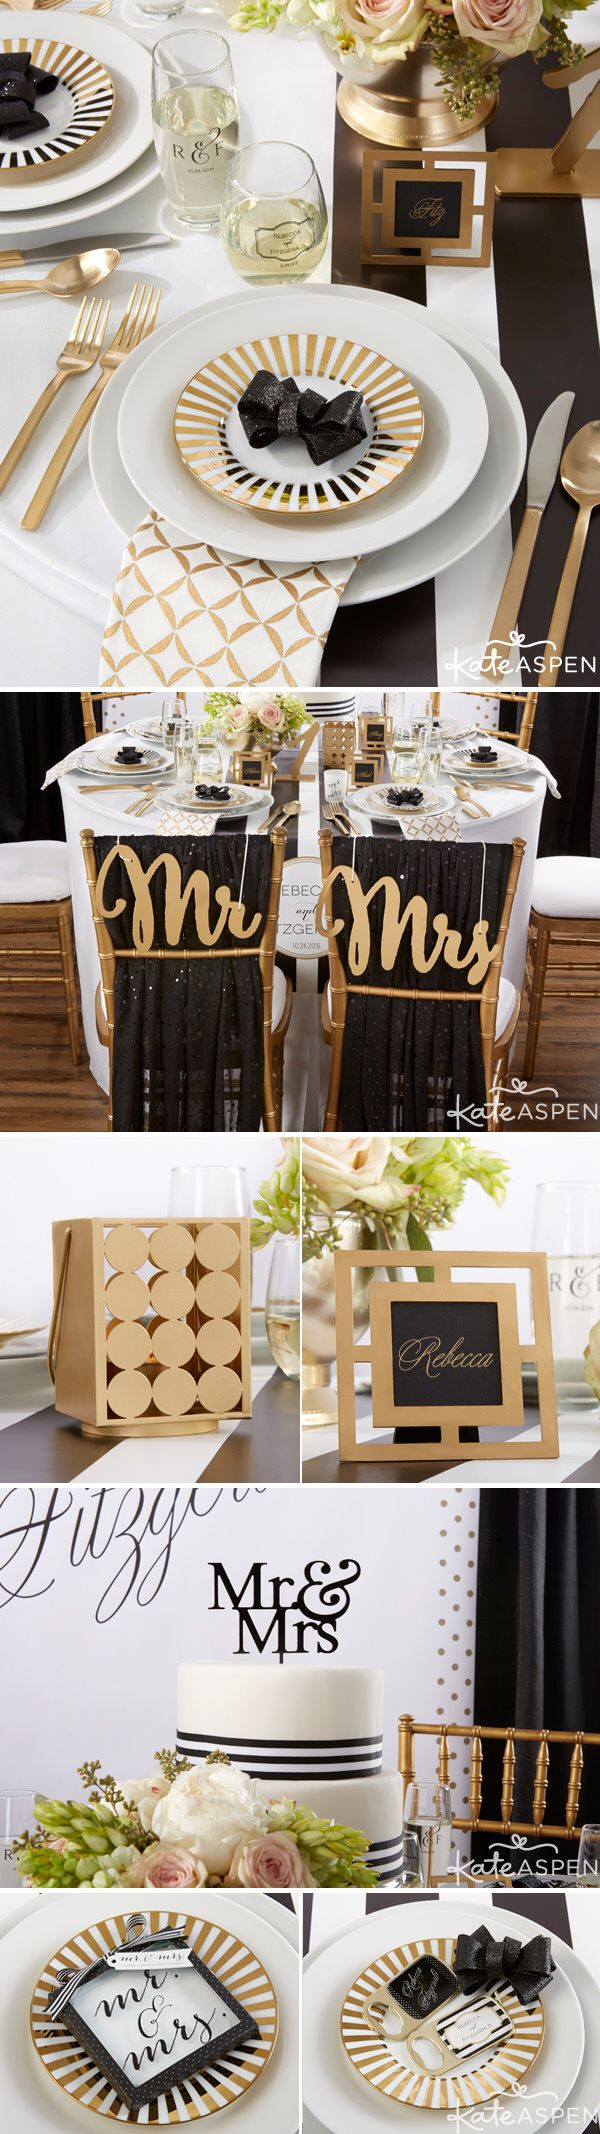 Black and white wedding decor ideas   best wedding decor images on Pinterest  Wedding ideas Wedding